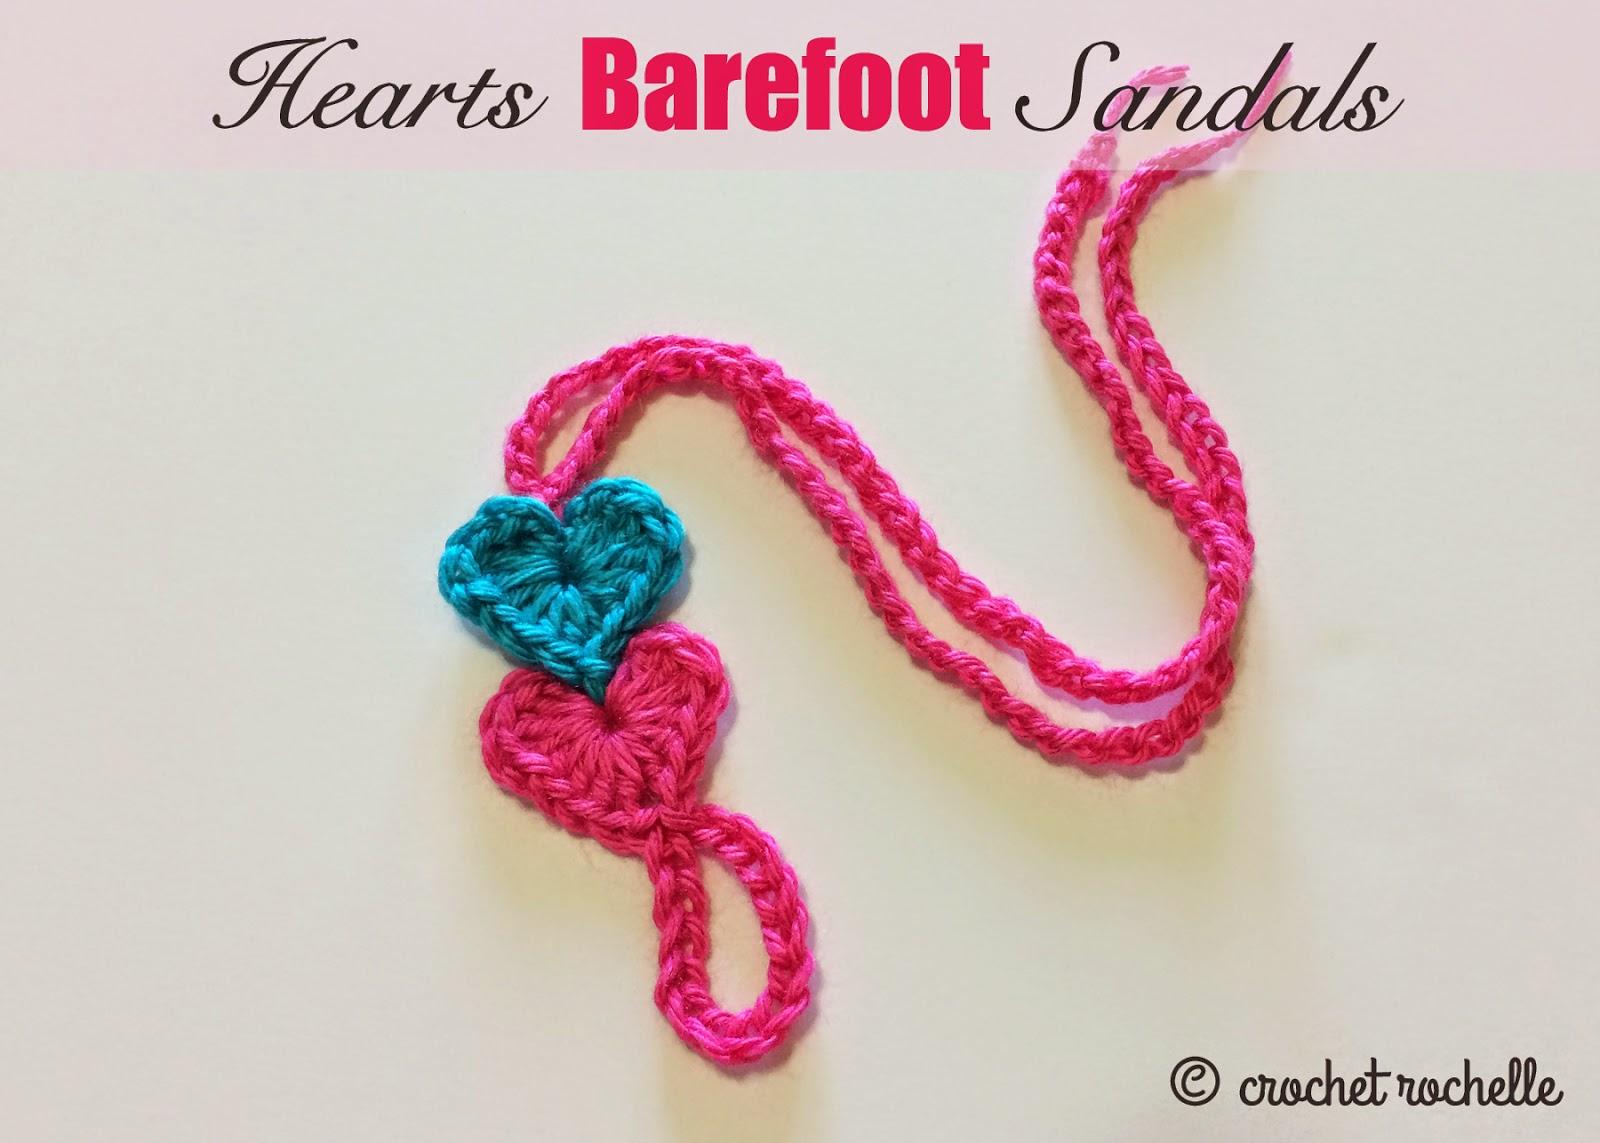 Crochet Rochelle Hearts Barefoot Sandals